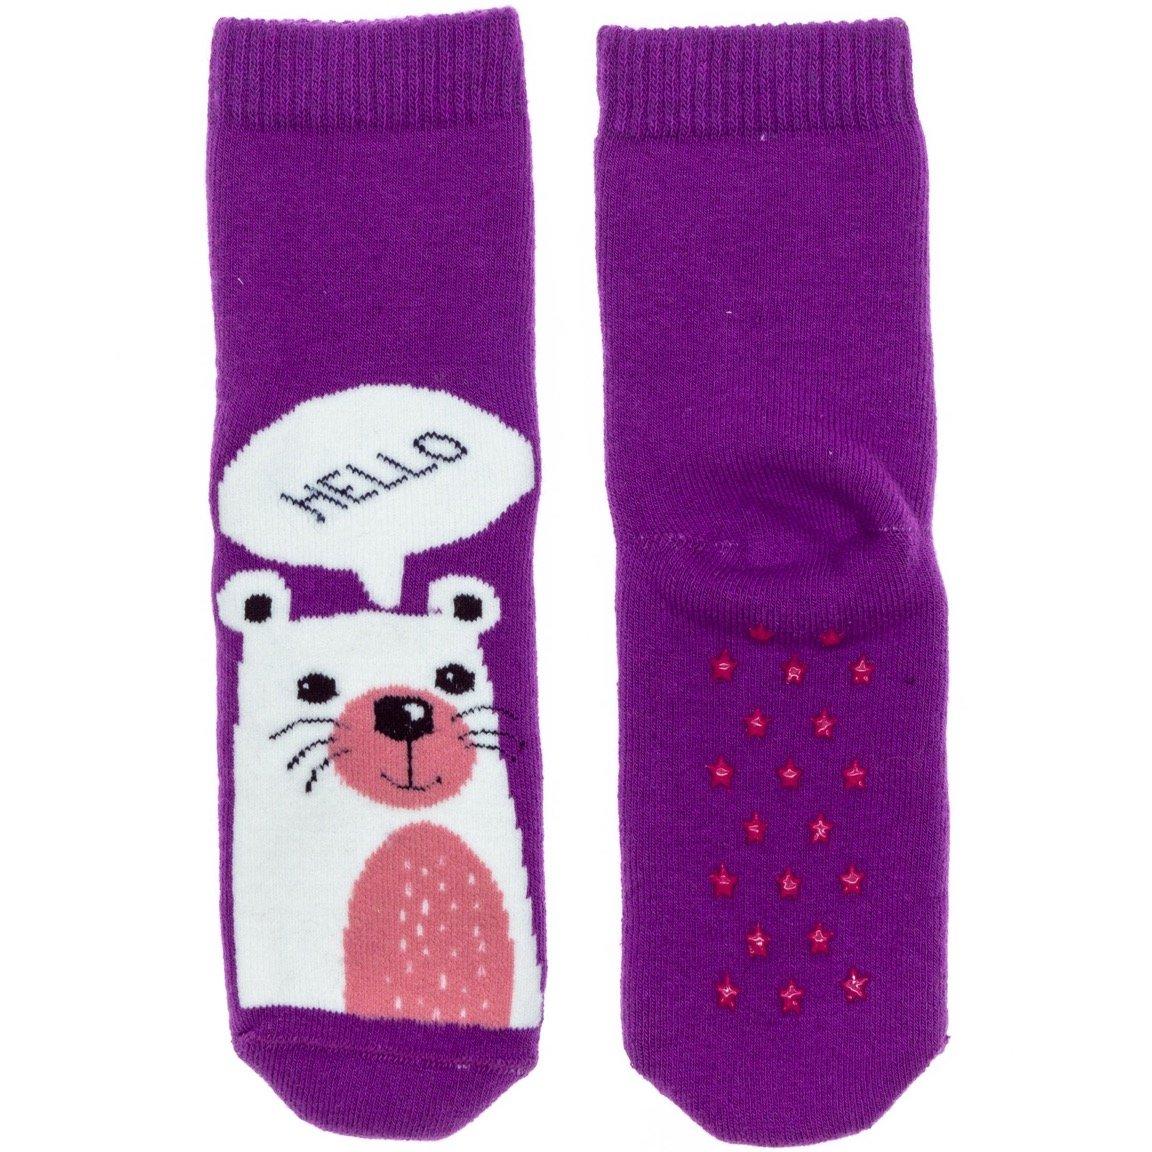 Bross παιδικές αντιολισθητικές κάλτσες «Hello Bear»